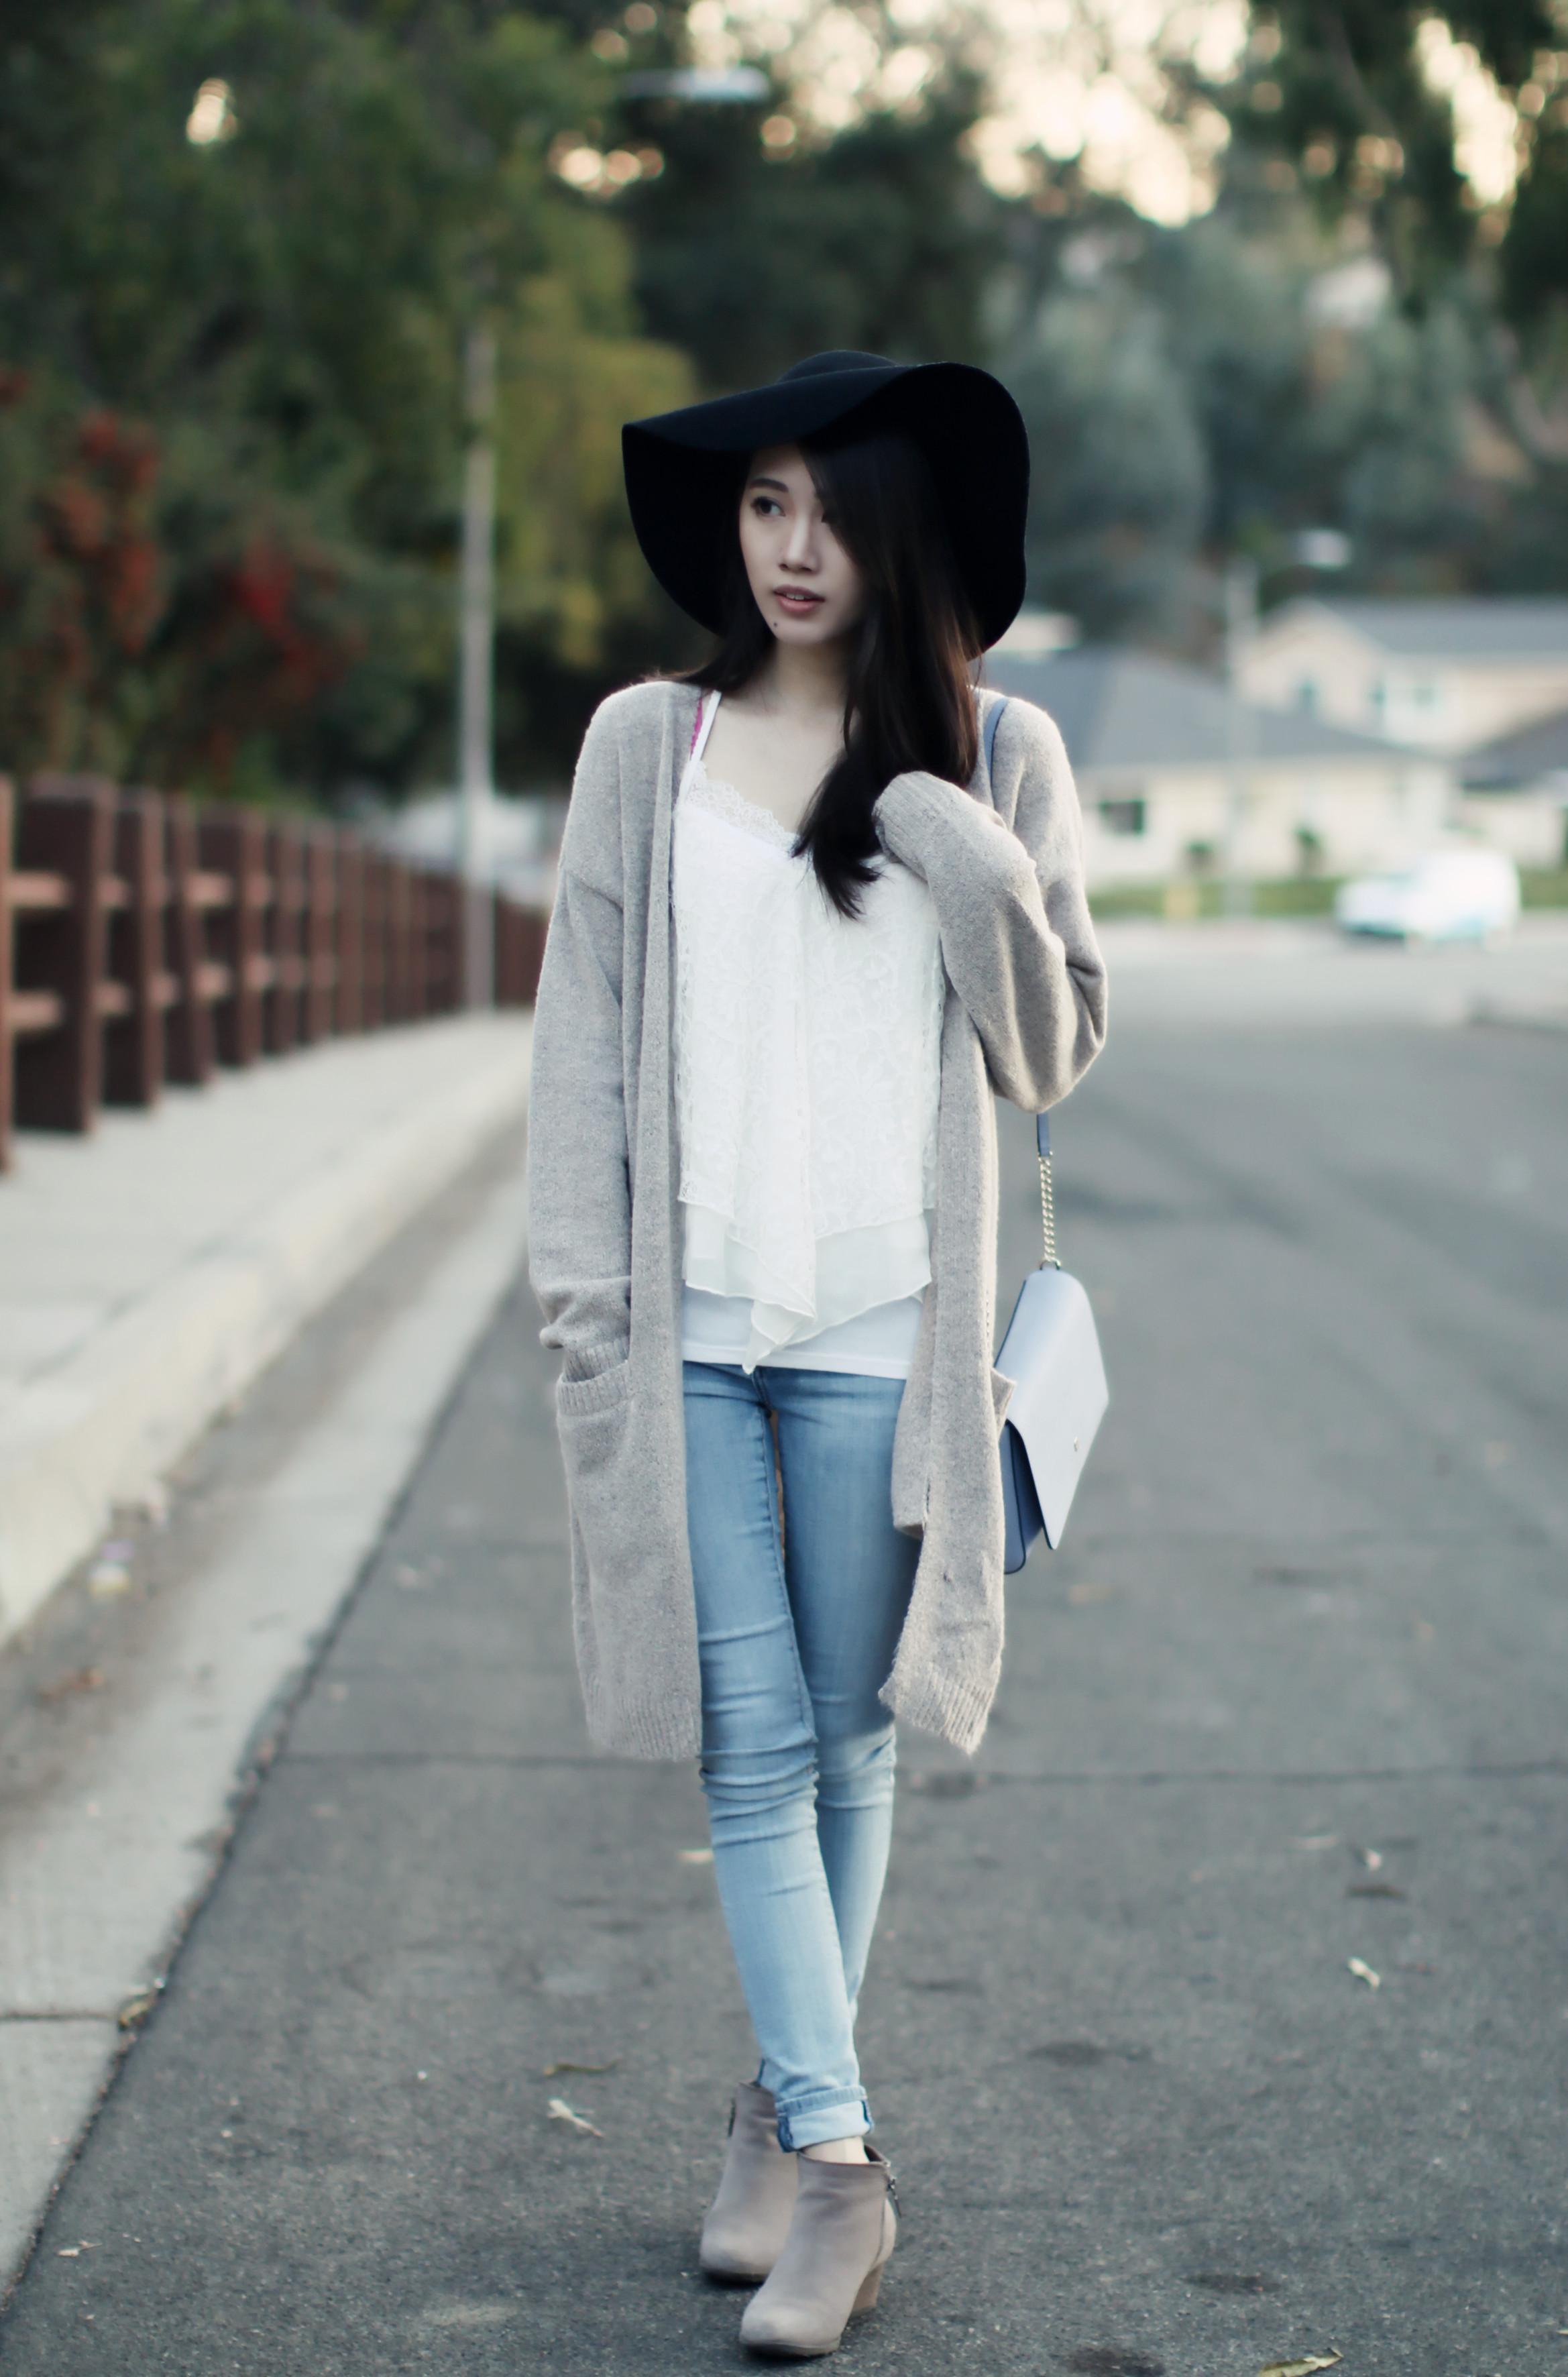 3838-ootd-fashion-style-outfitoftheday-wiwt-nordstrom-abercrombie-bohemian-fallfashion-forever21-f21-f21xme-koreanfashion-elizabeeetht-clothestoyouuu